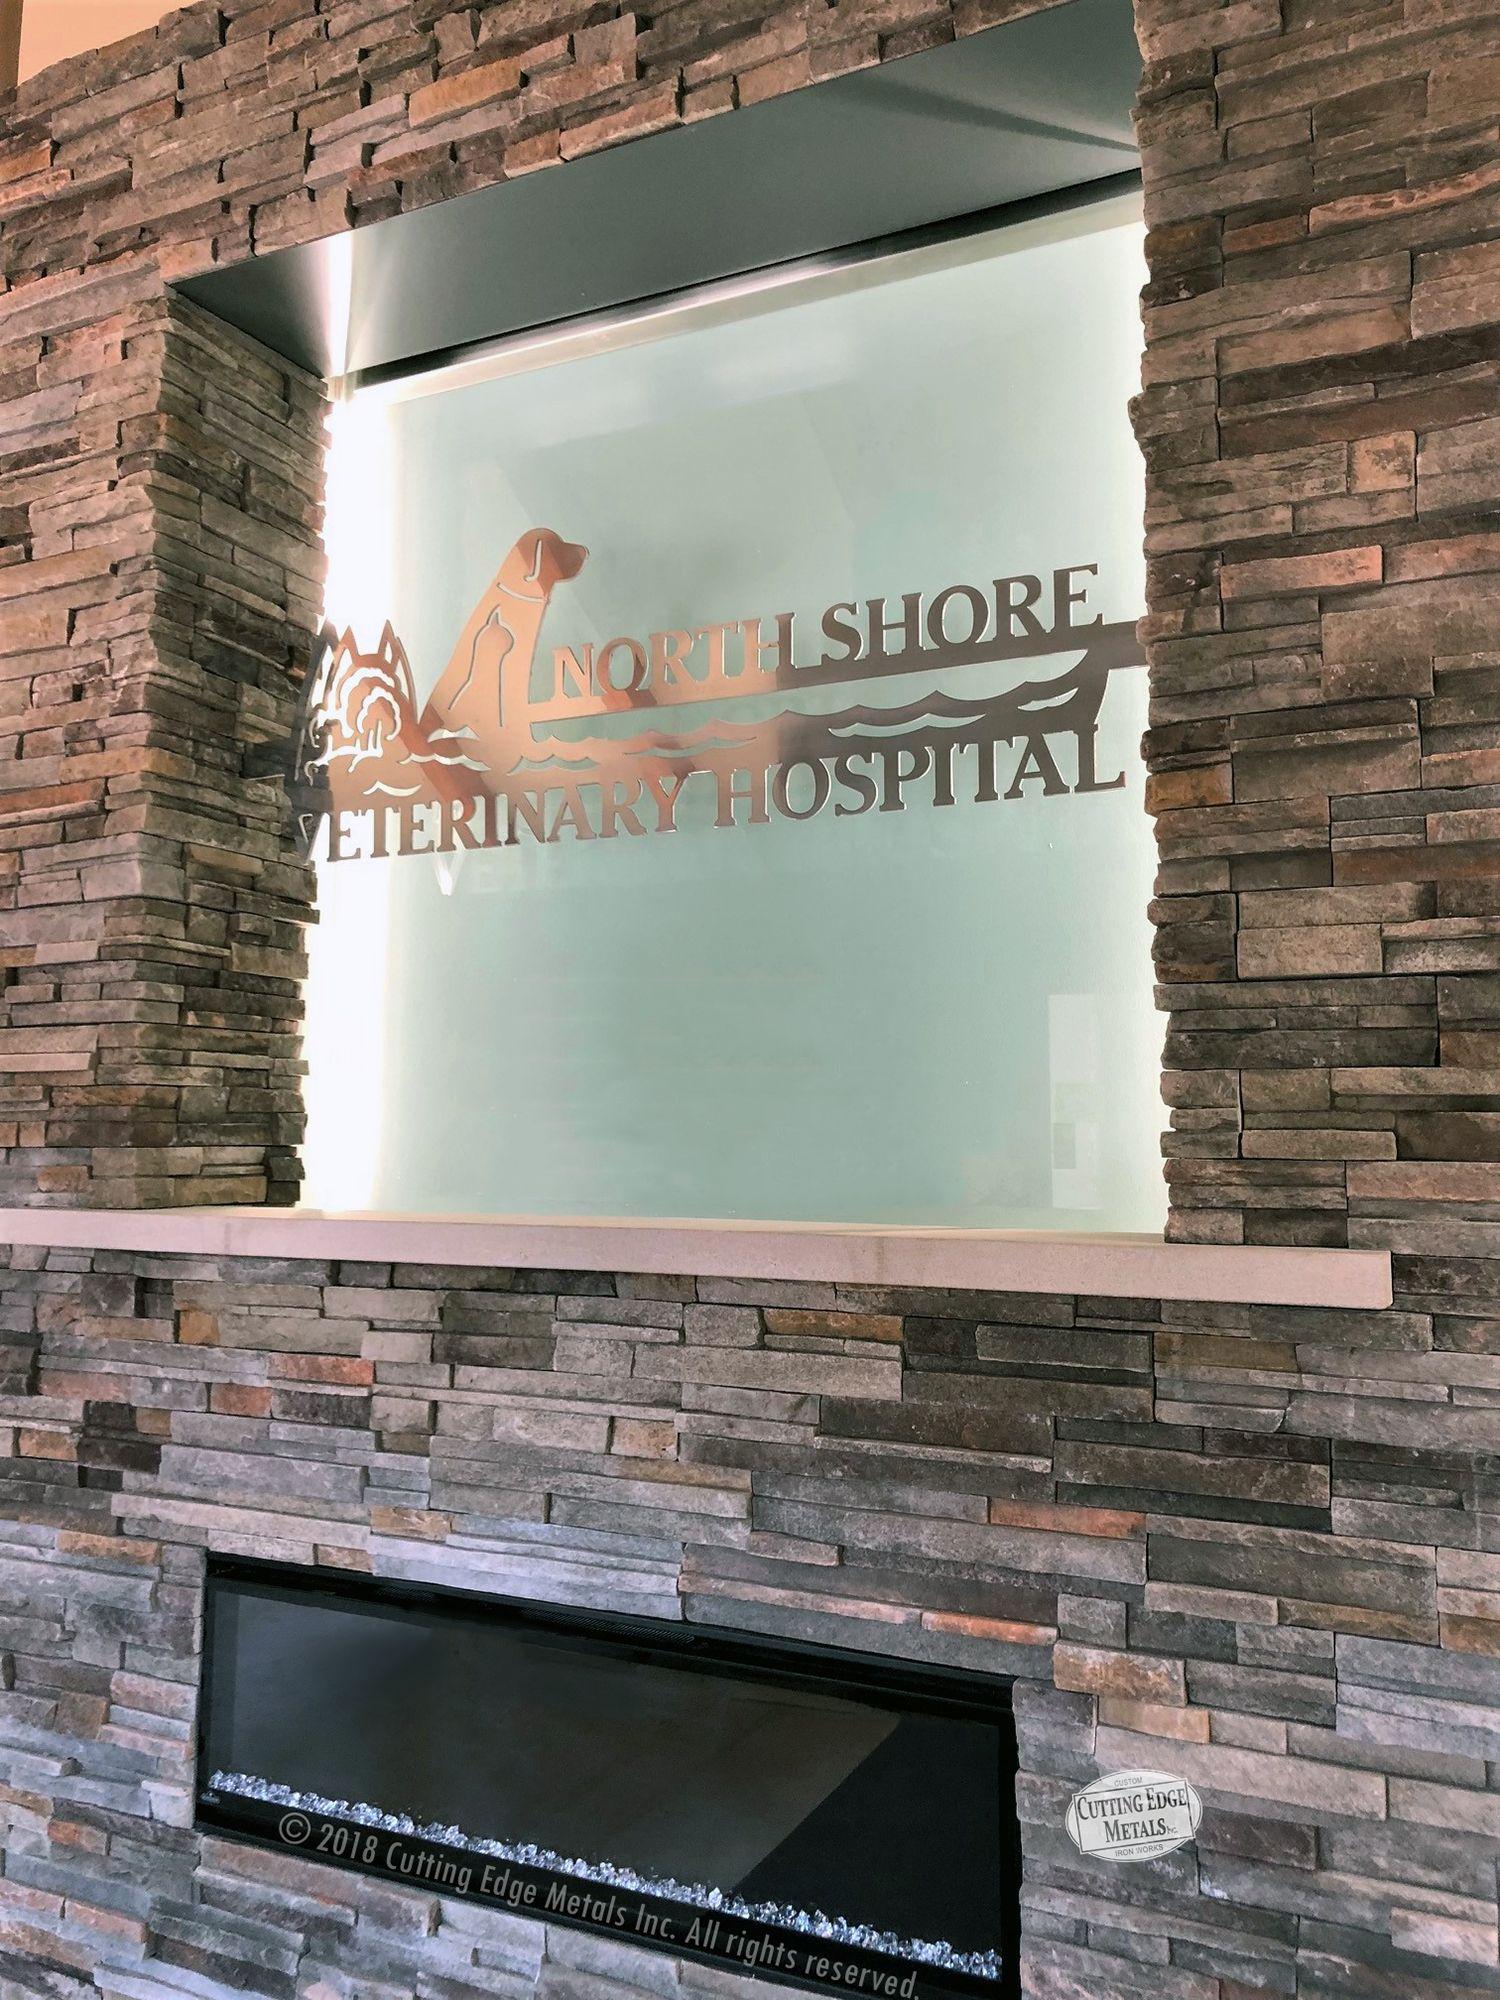 13++ North shore animal hospital ideas